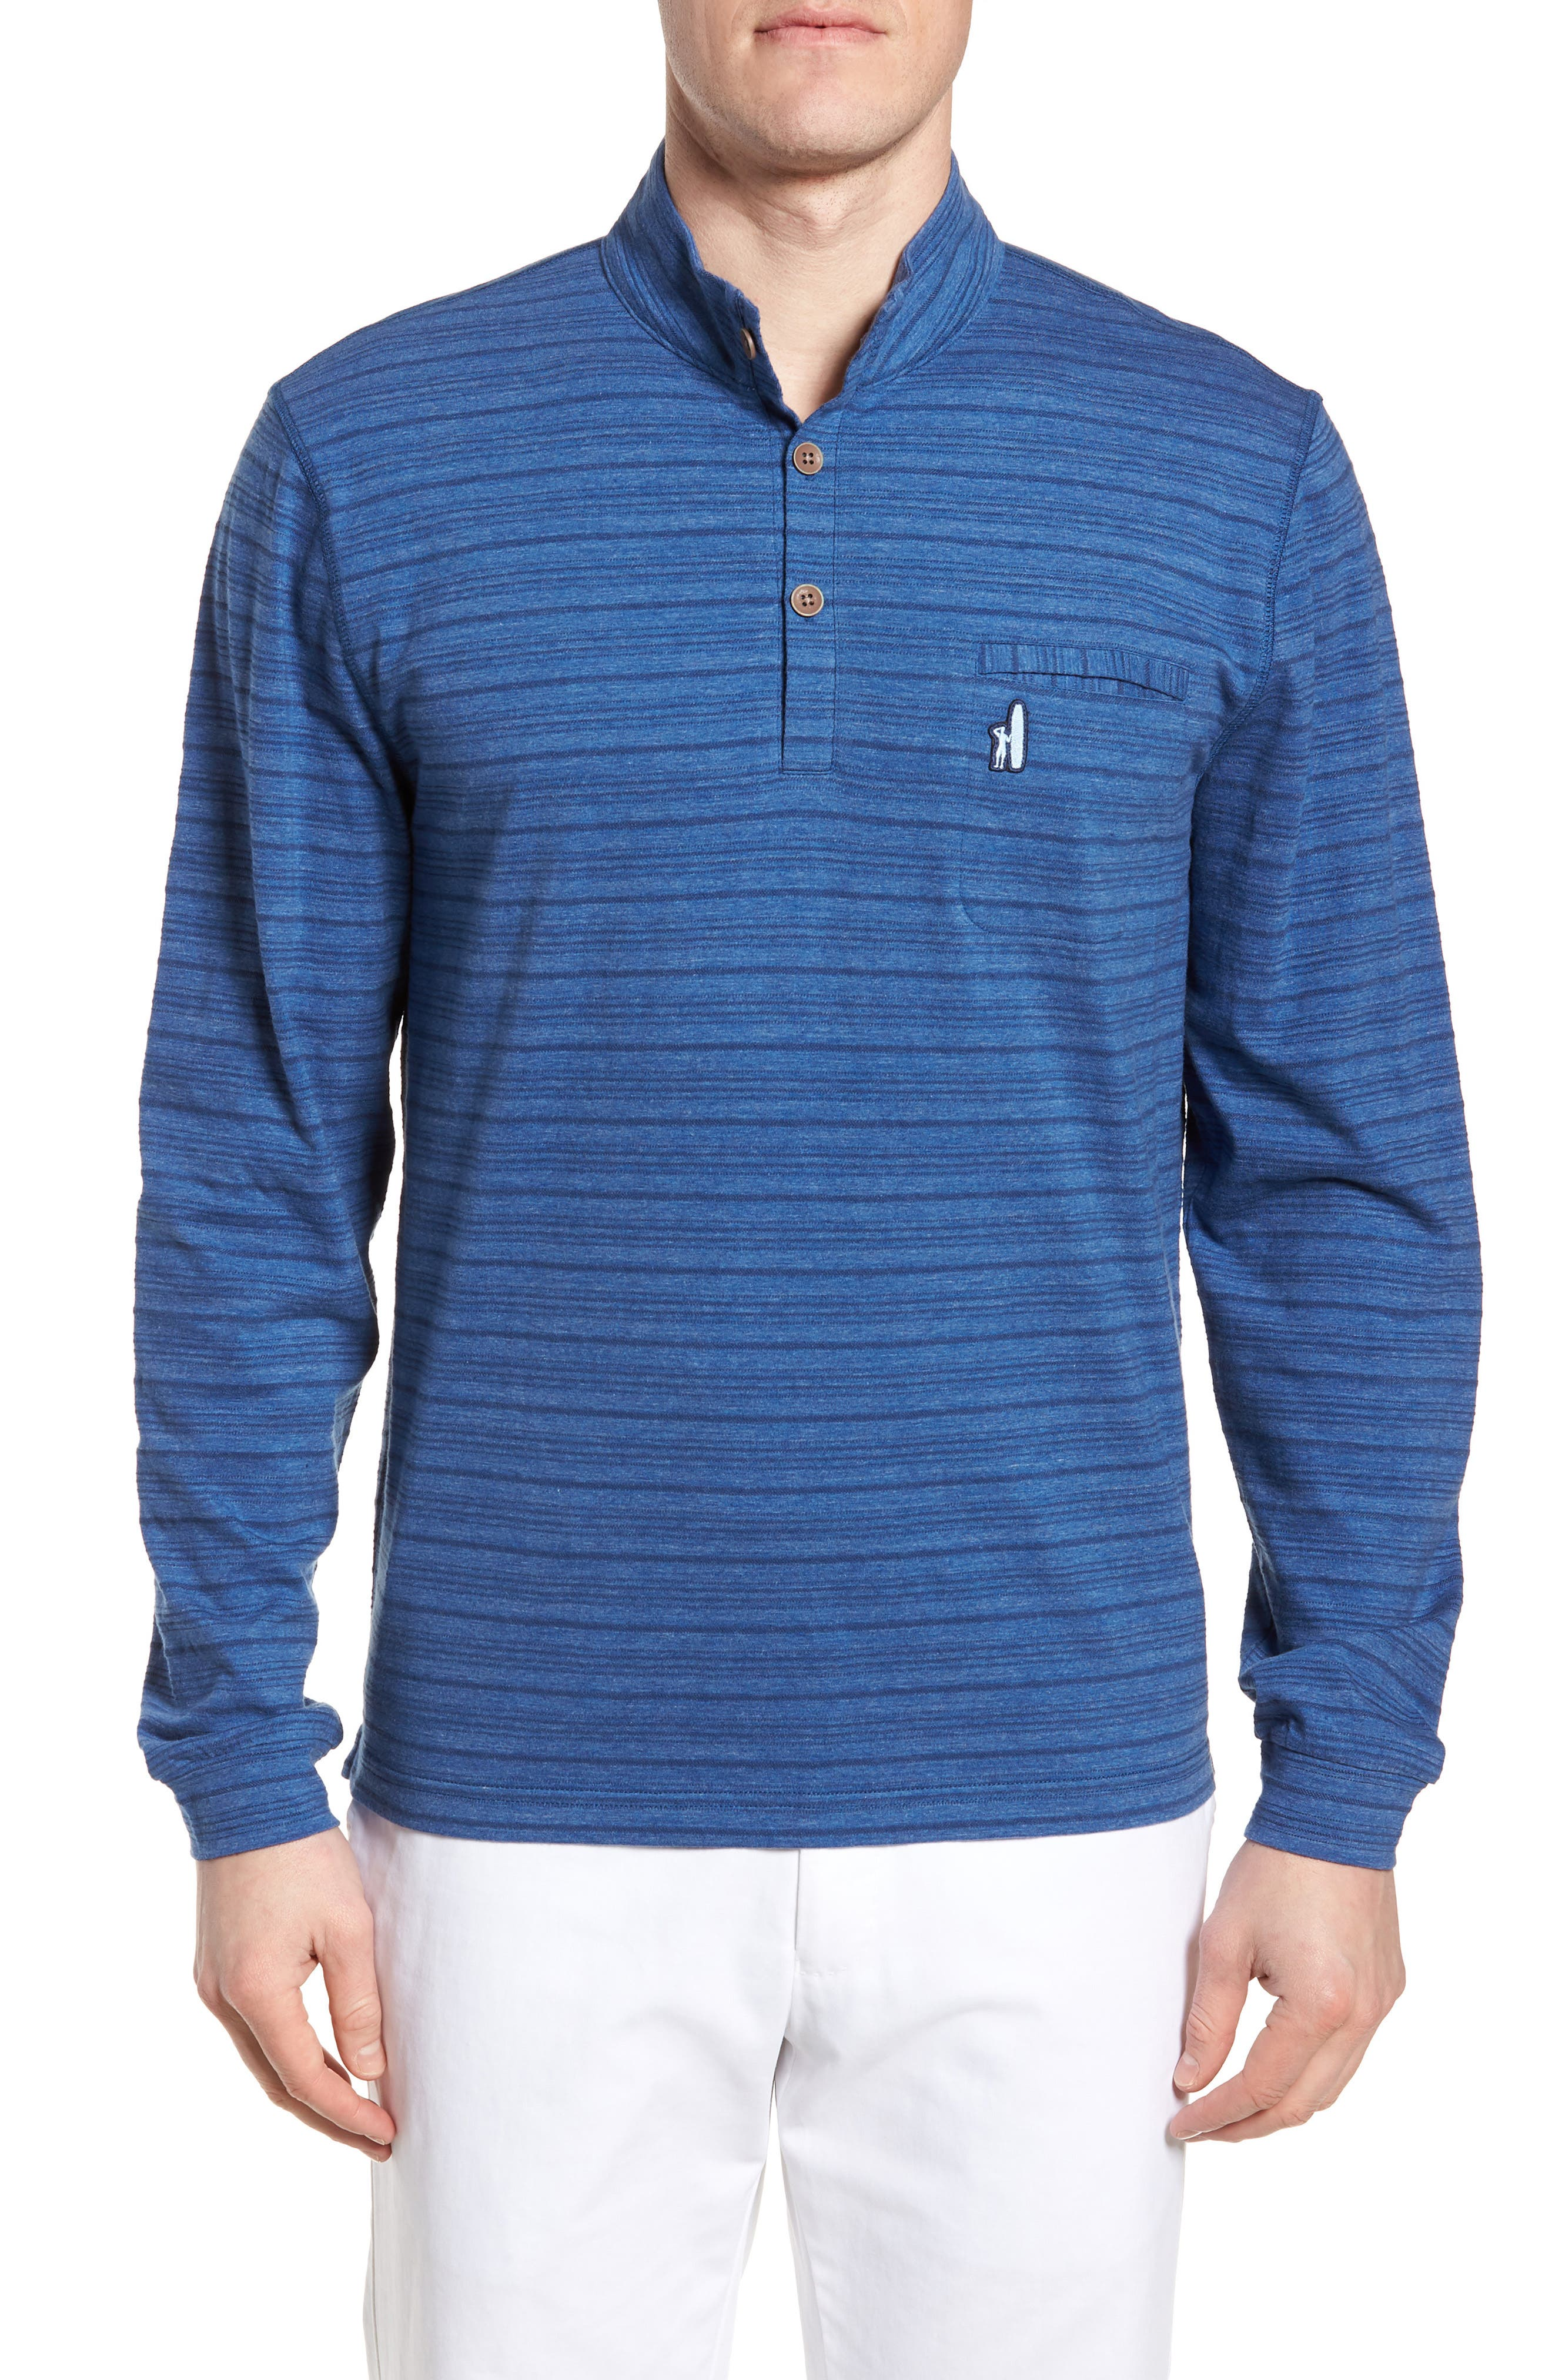 Calder Regular Fit T-Shirt,                             Main thumbnail 1, color,                             200